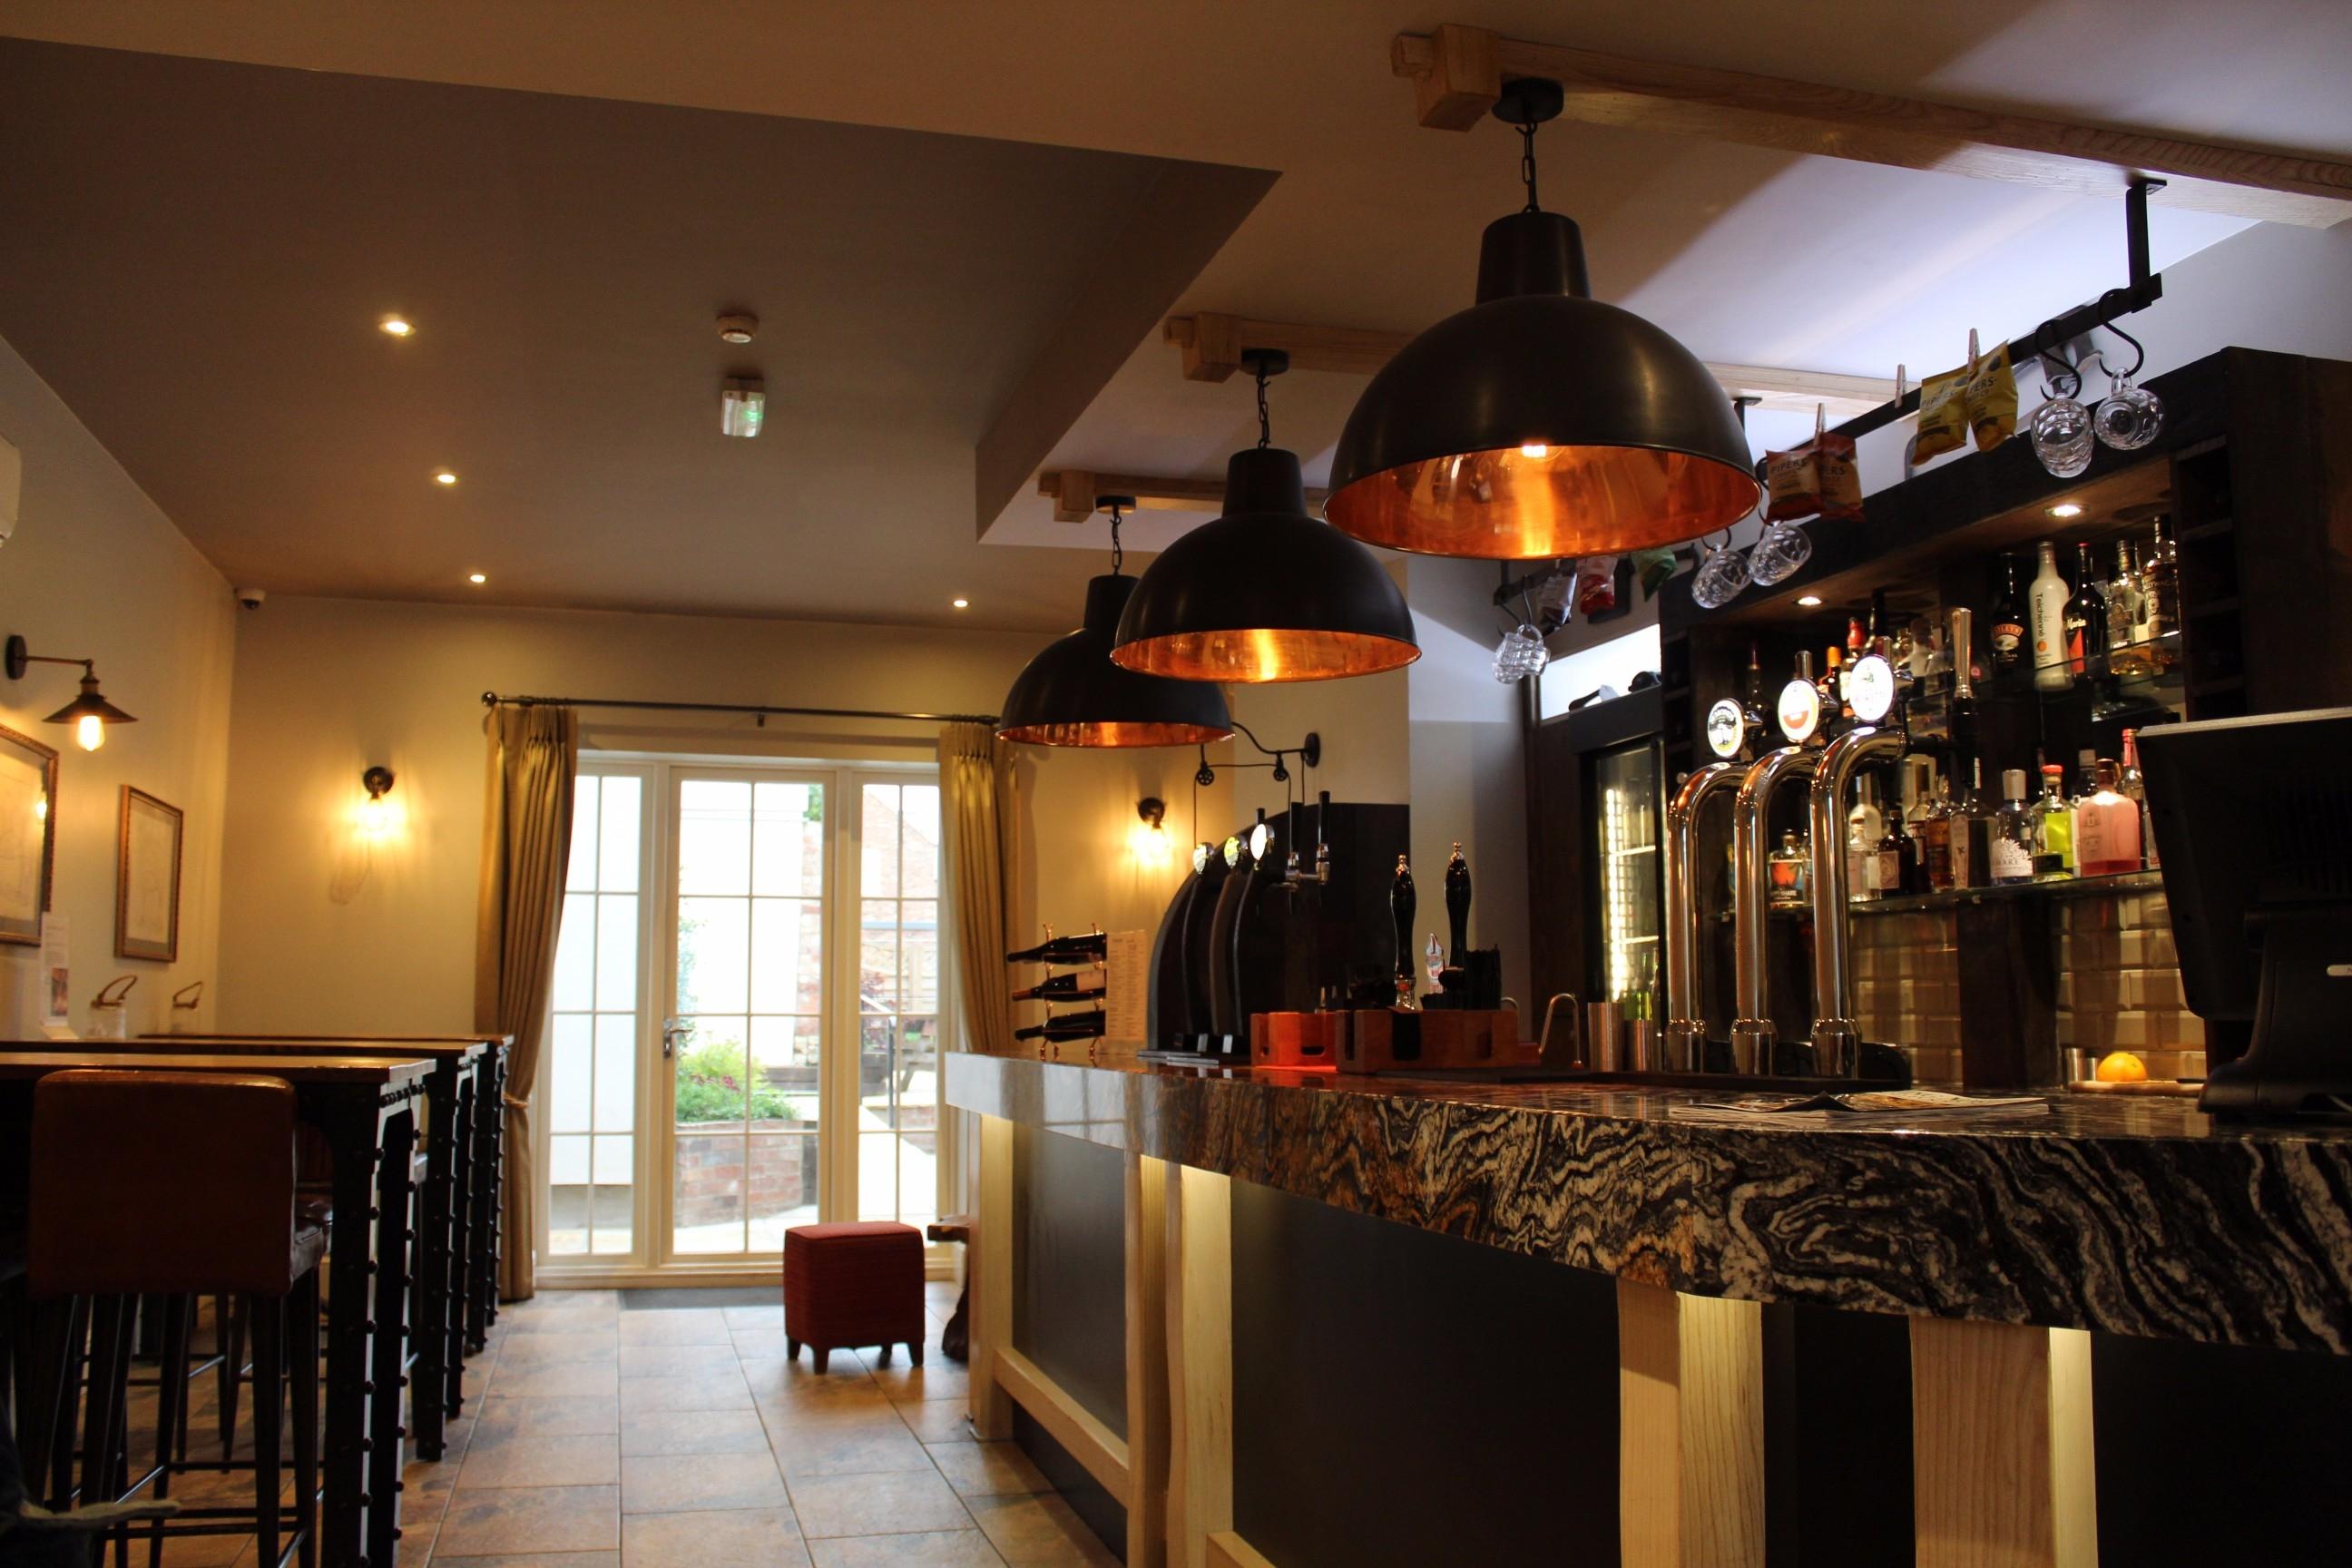 stamfords steak restaurant pocklington (4)